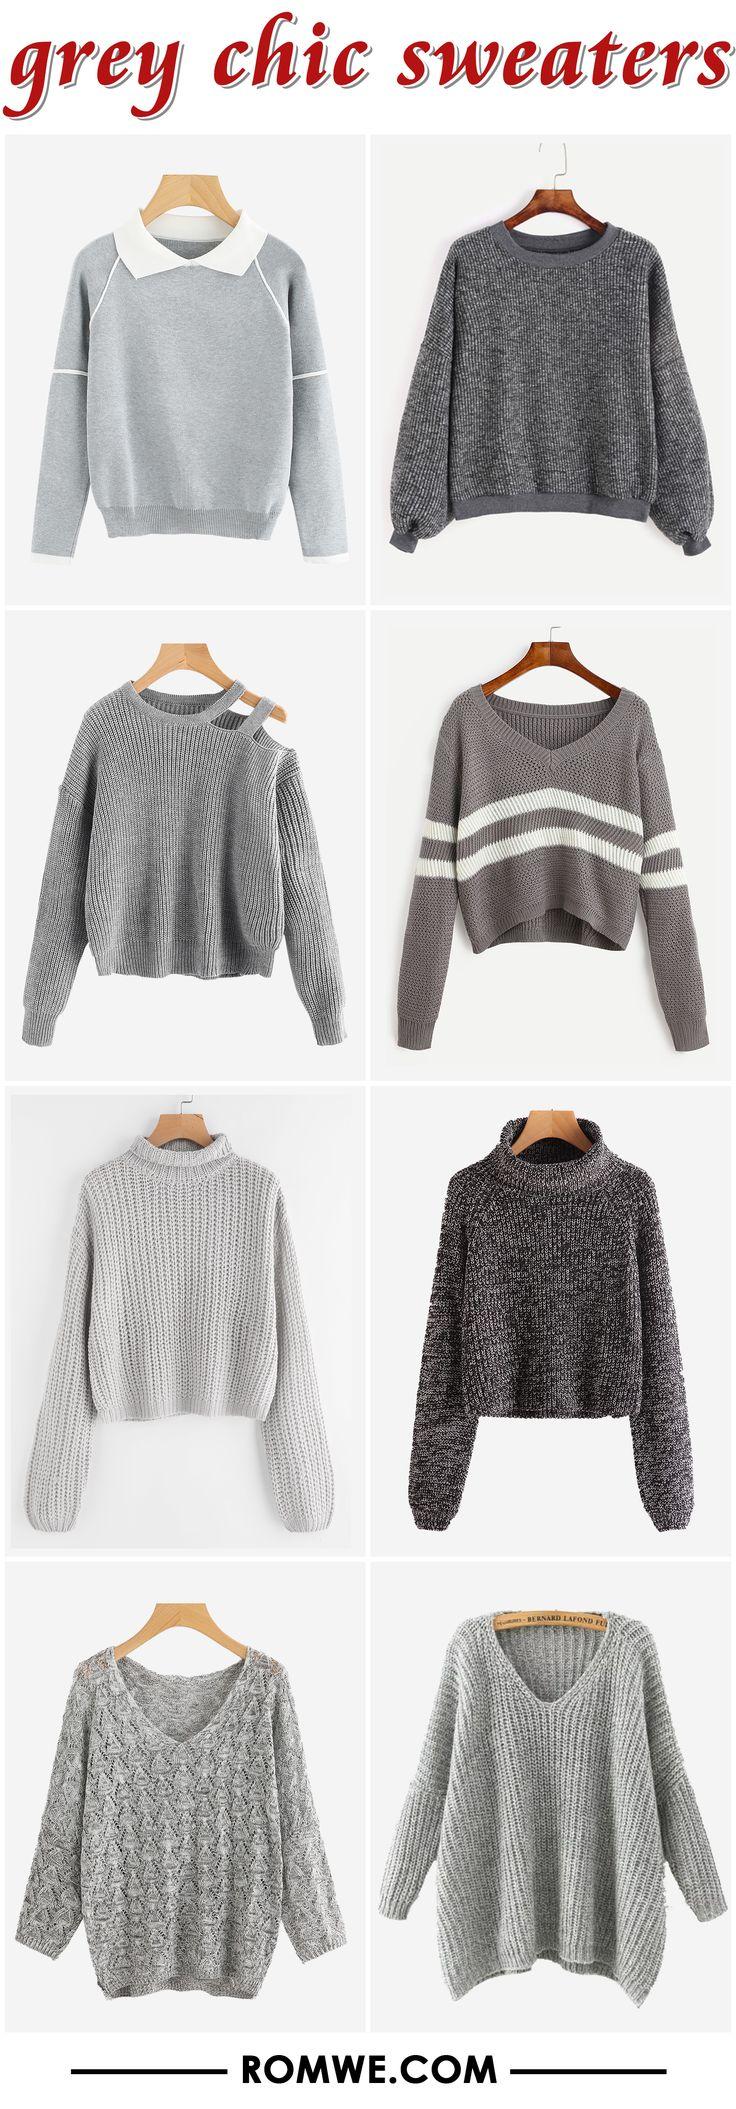 black friday sale - grey chic sweaters 2017 - rowme.com